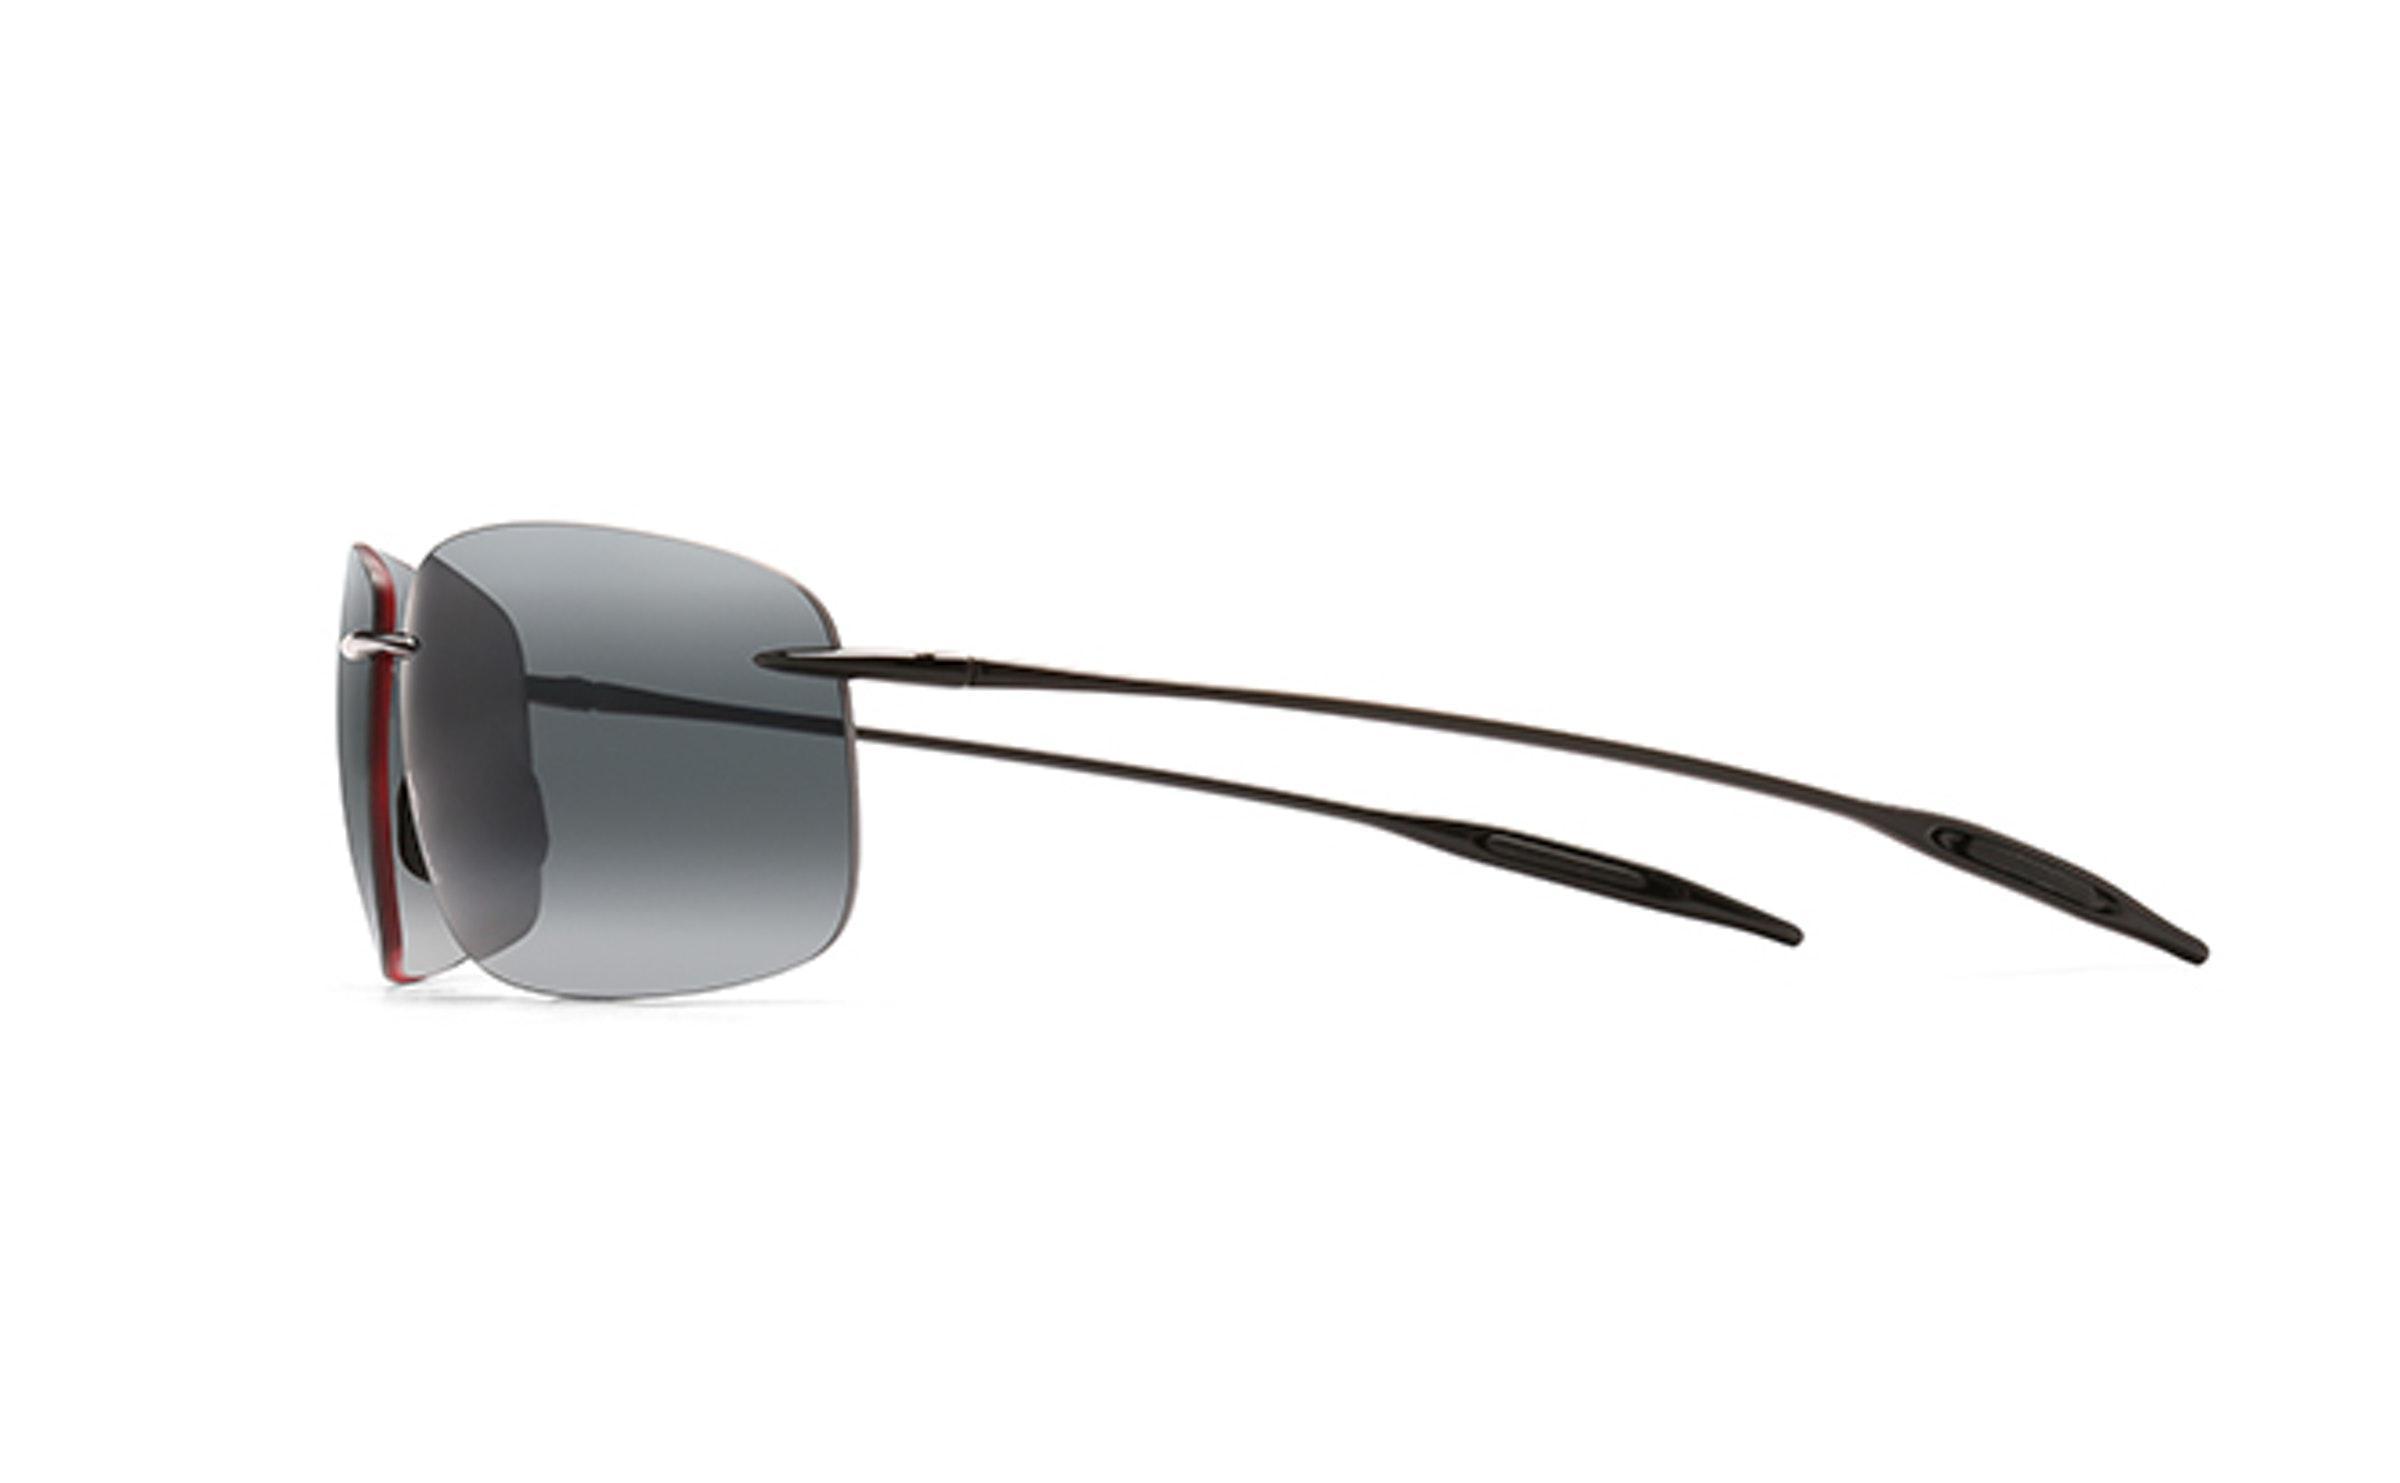 6d8db2cc00c Lyst - Maui Jim Breakwall 422-02 Polarized Rimless Sunglasses for Men